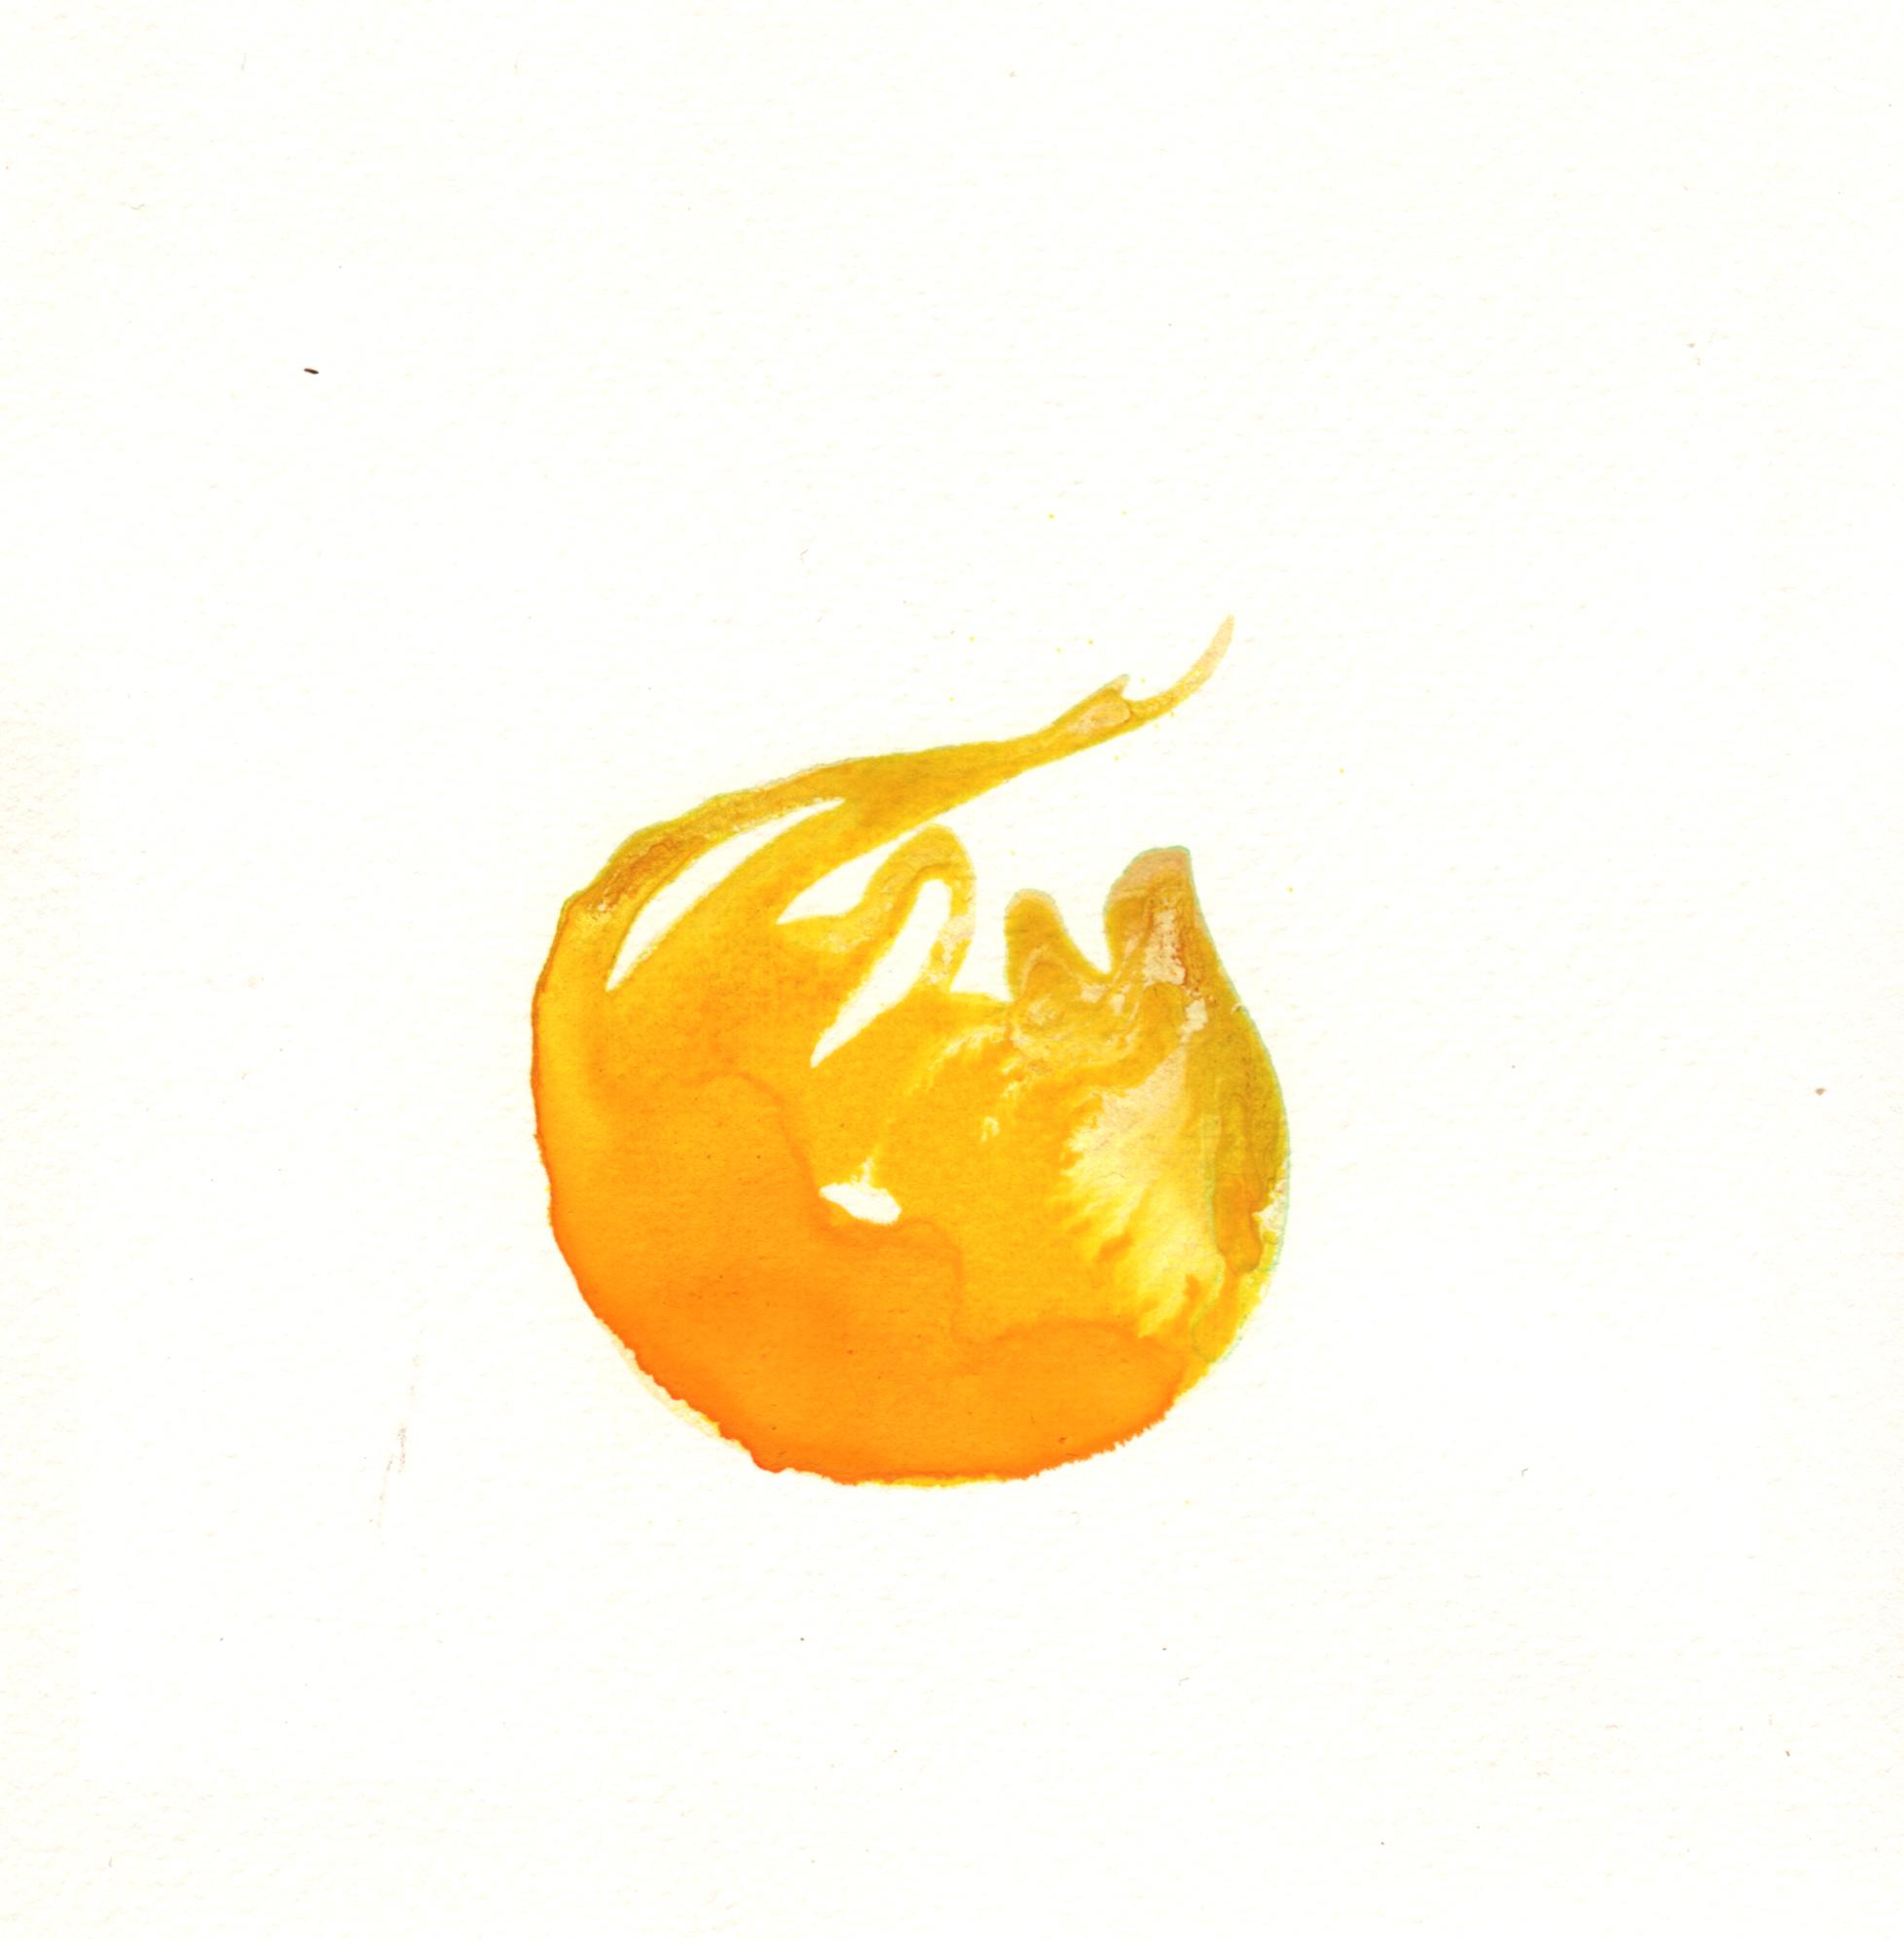 98.Ranunculus.Bud.5.17.14.jpg